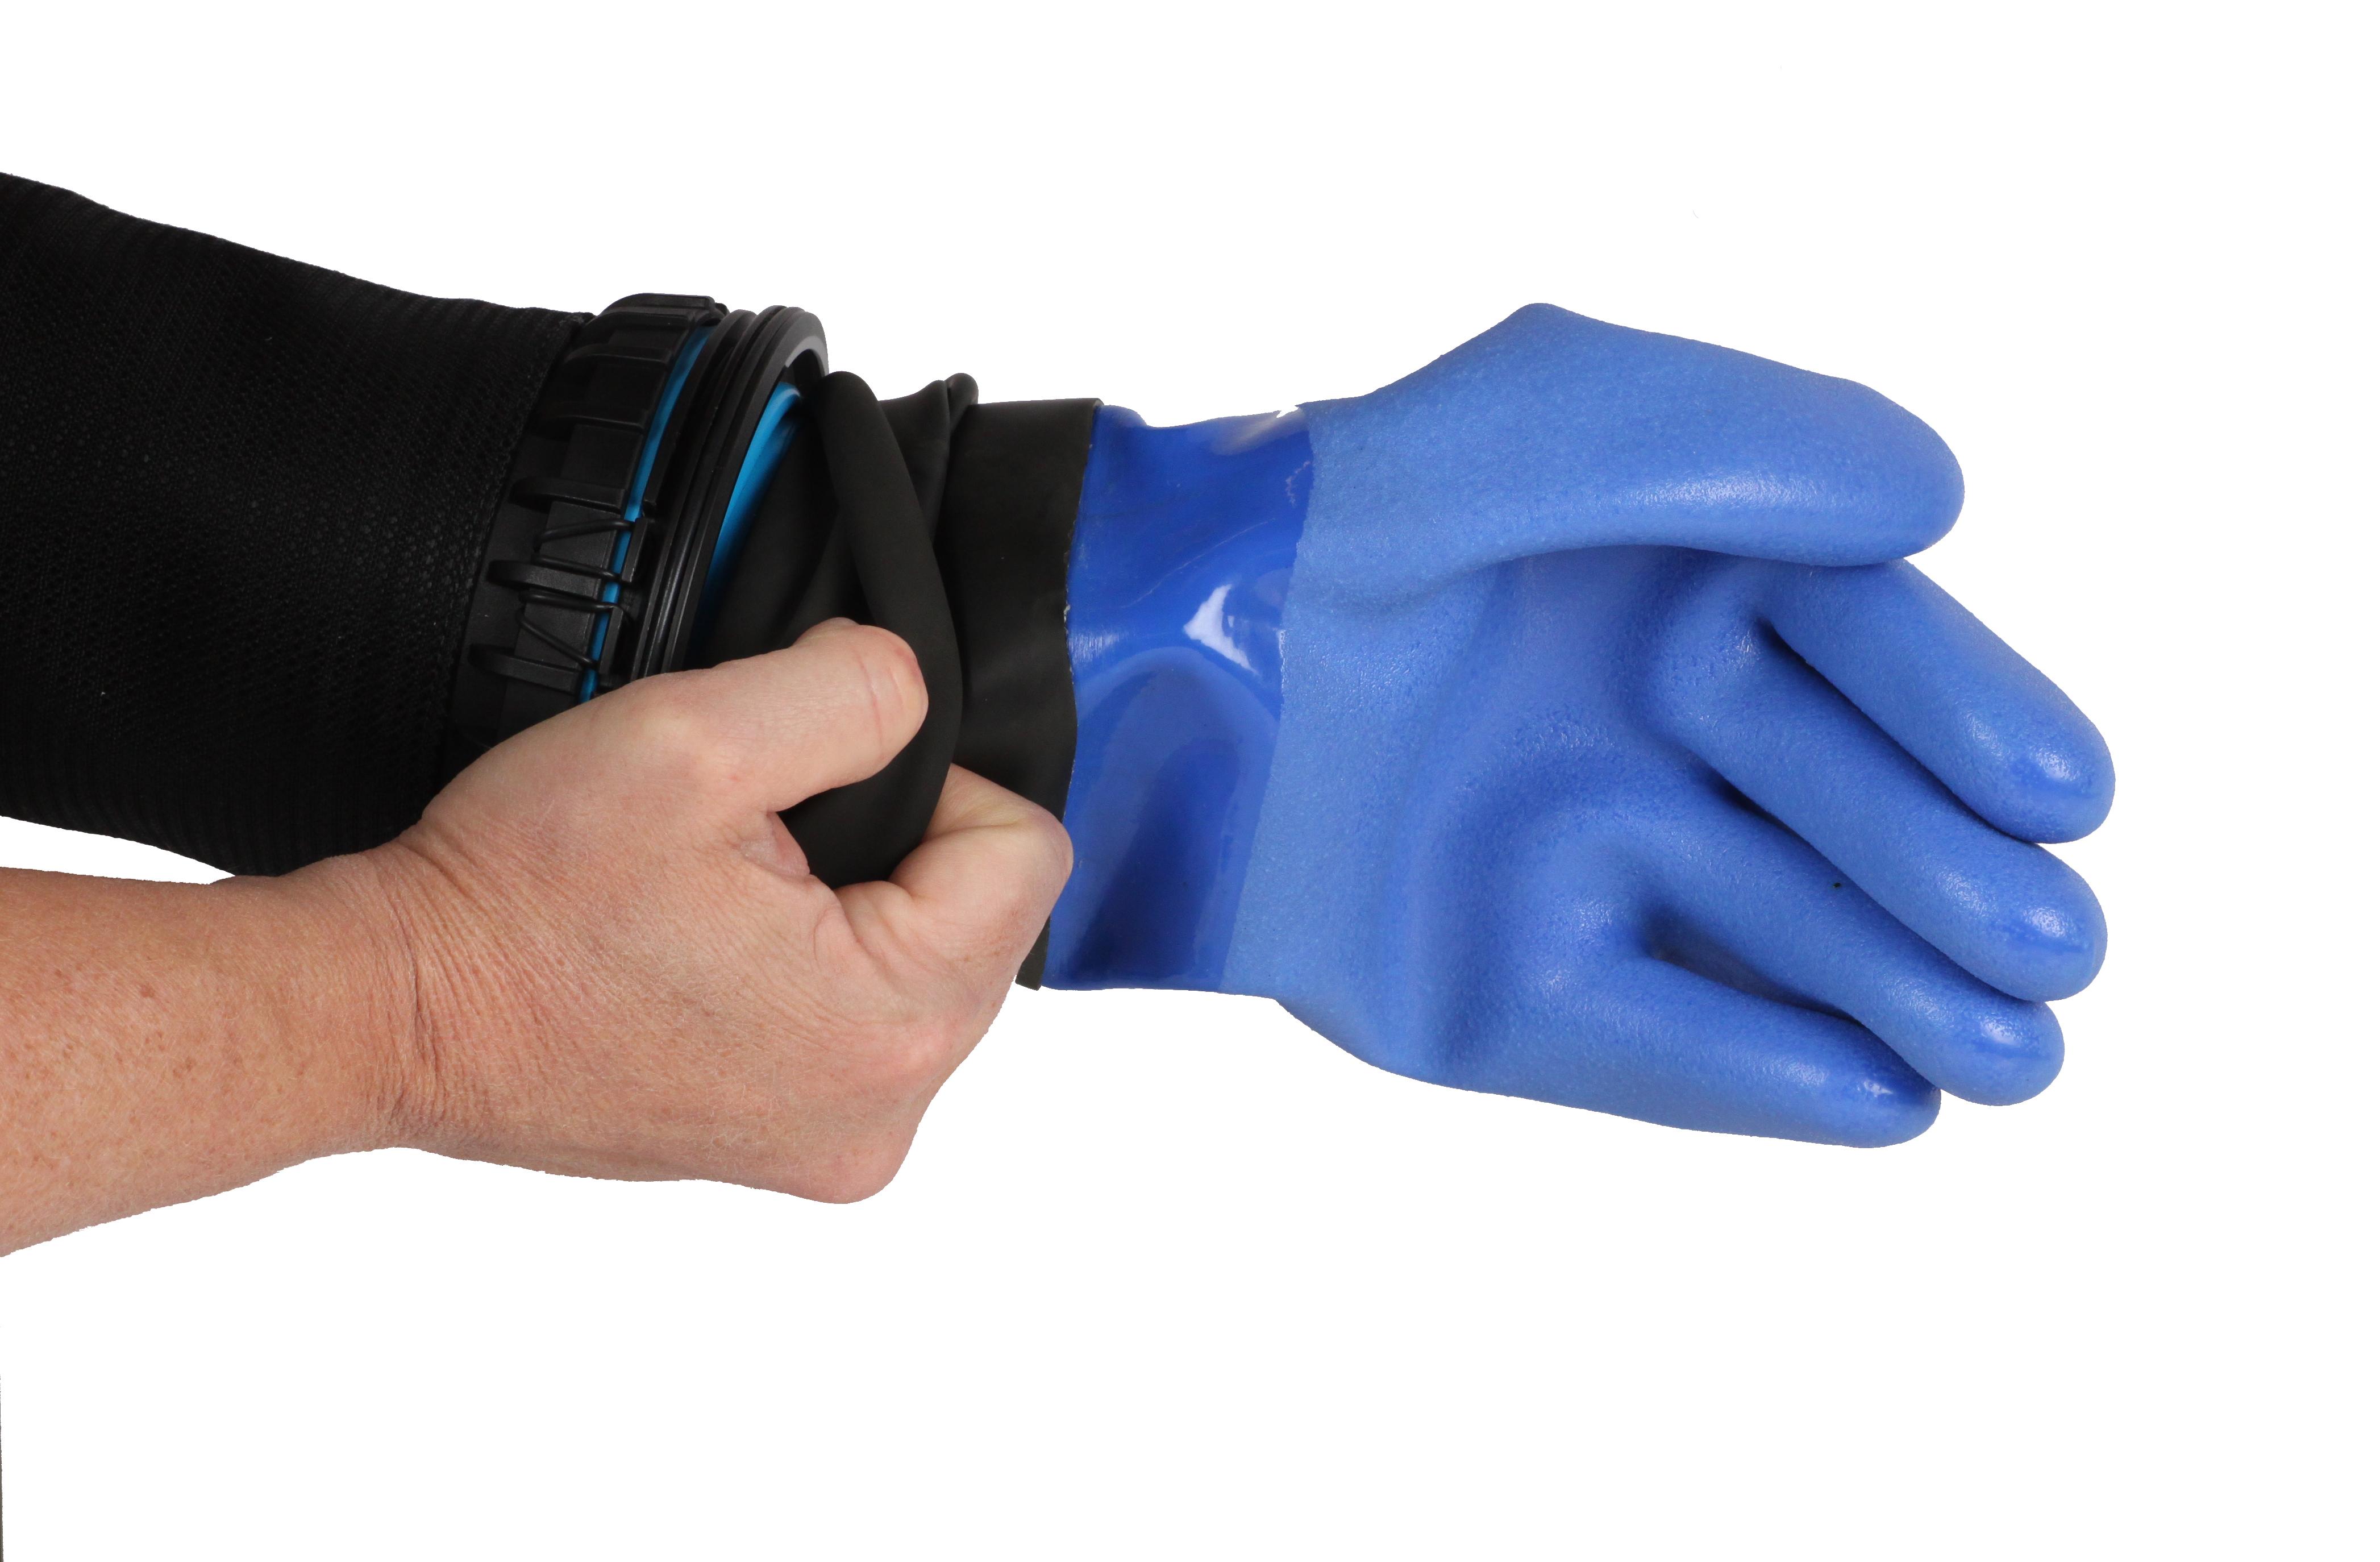 SI TECH's NEVA Dry Glove System